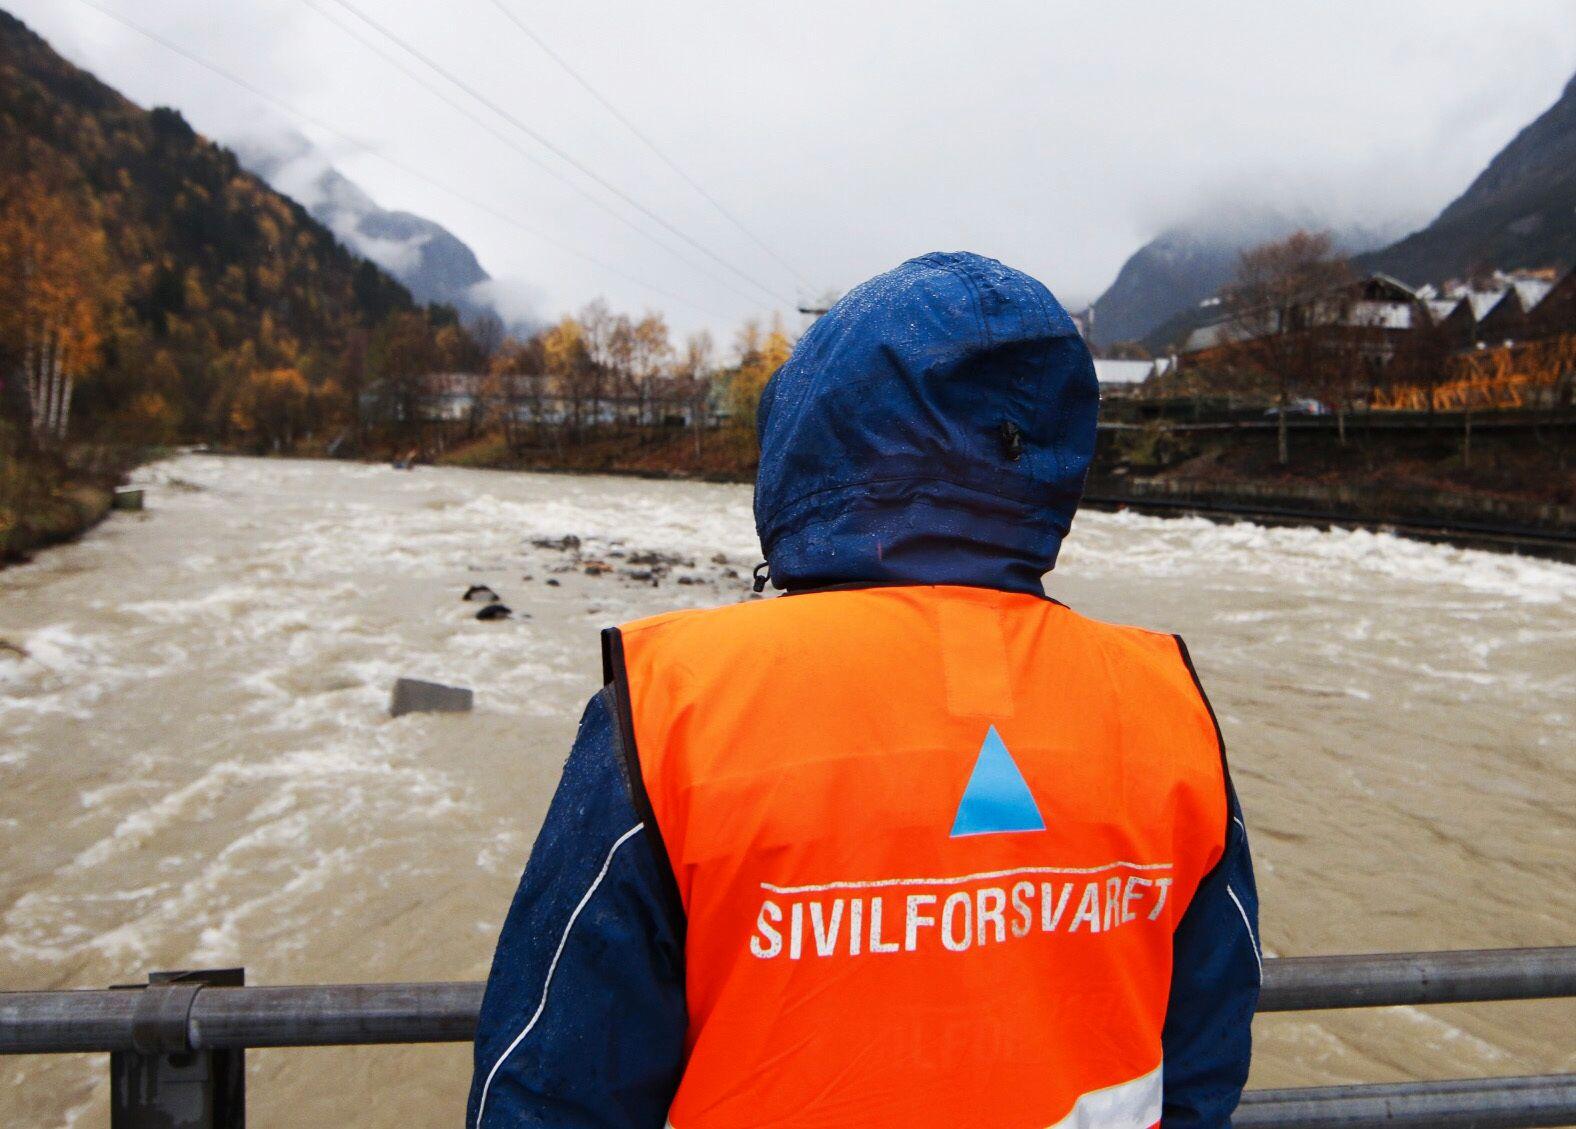 FELLES: Sverige ønsker økt samarbeid om sivilforsvar. I Norge bistår Sivilforsvaret blant annet ved naturkatastrofer, som her ved flommen i Odda i 2014.